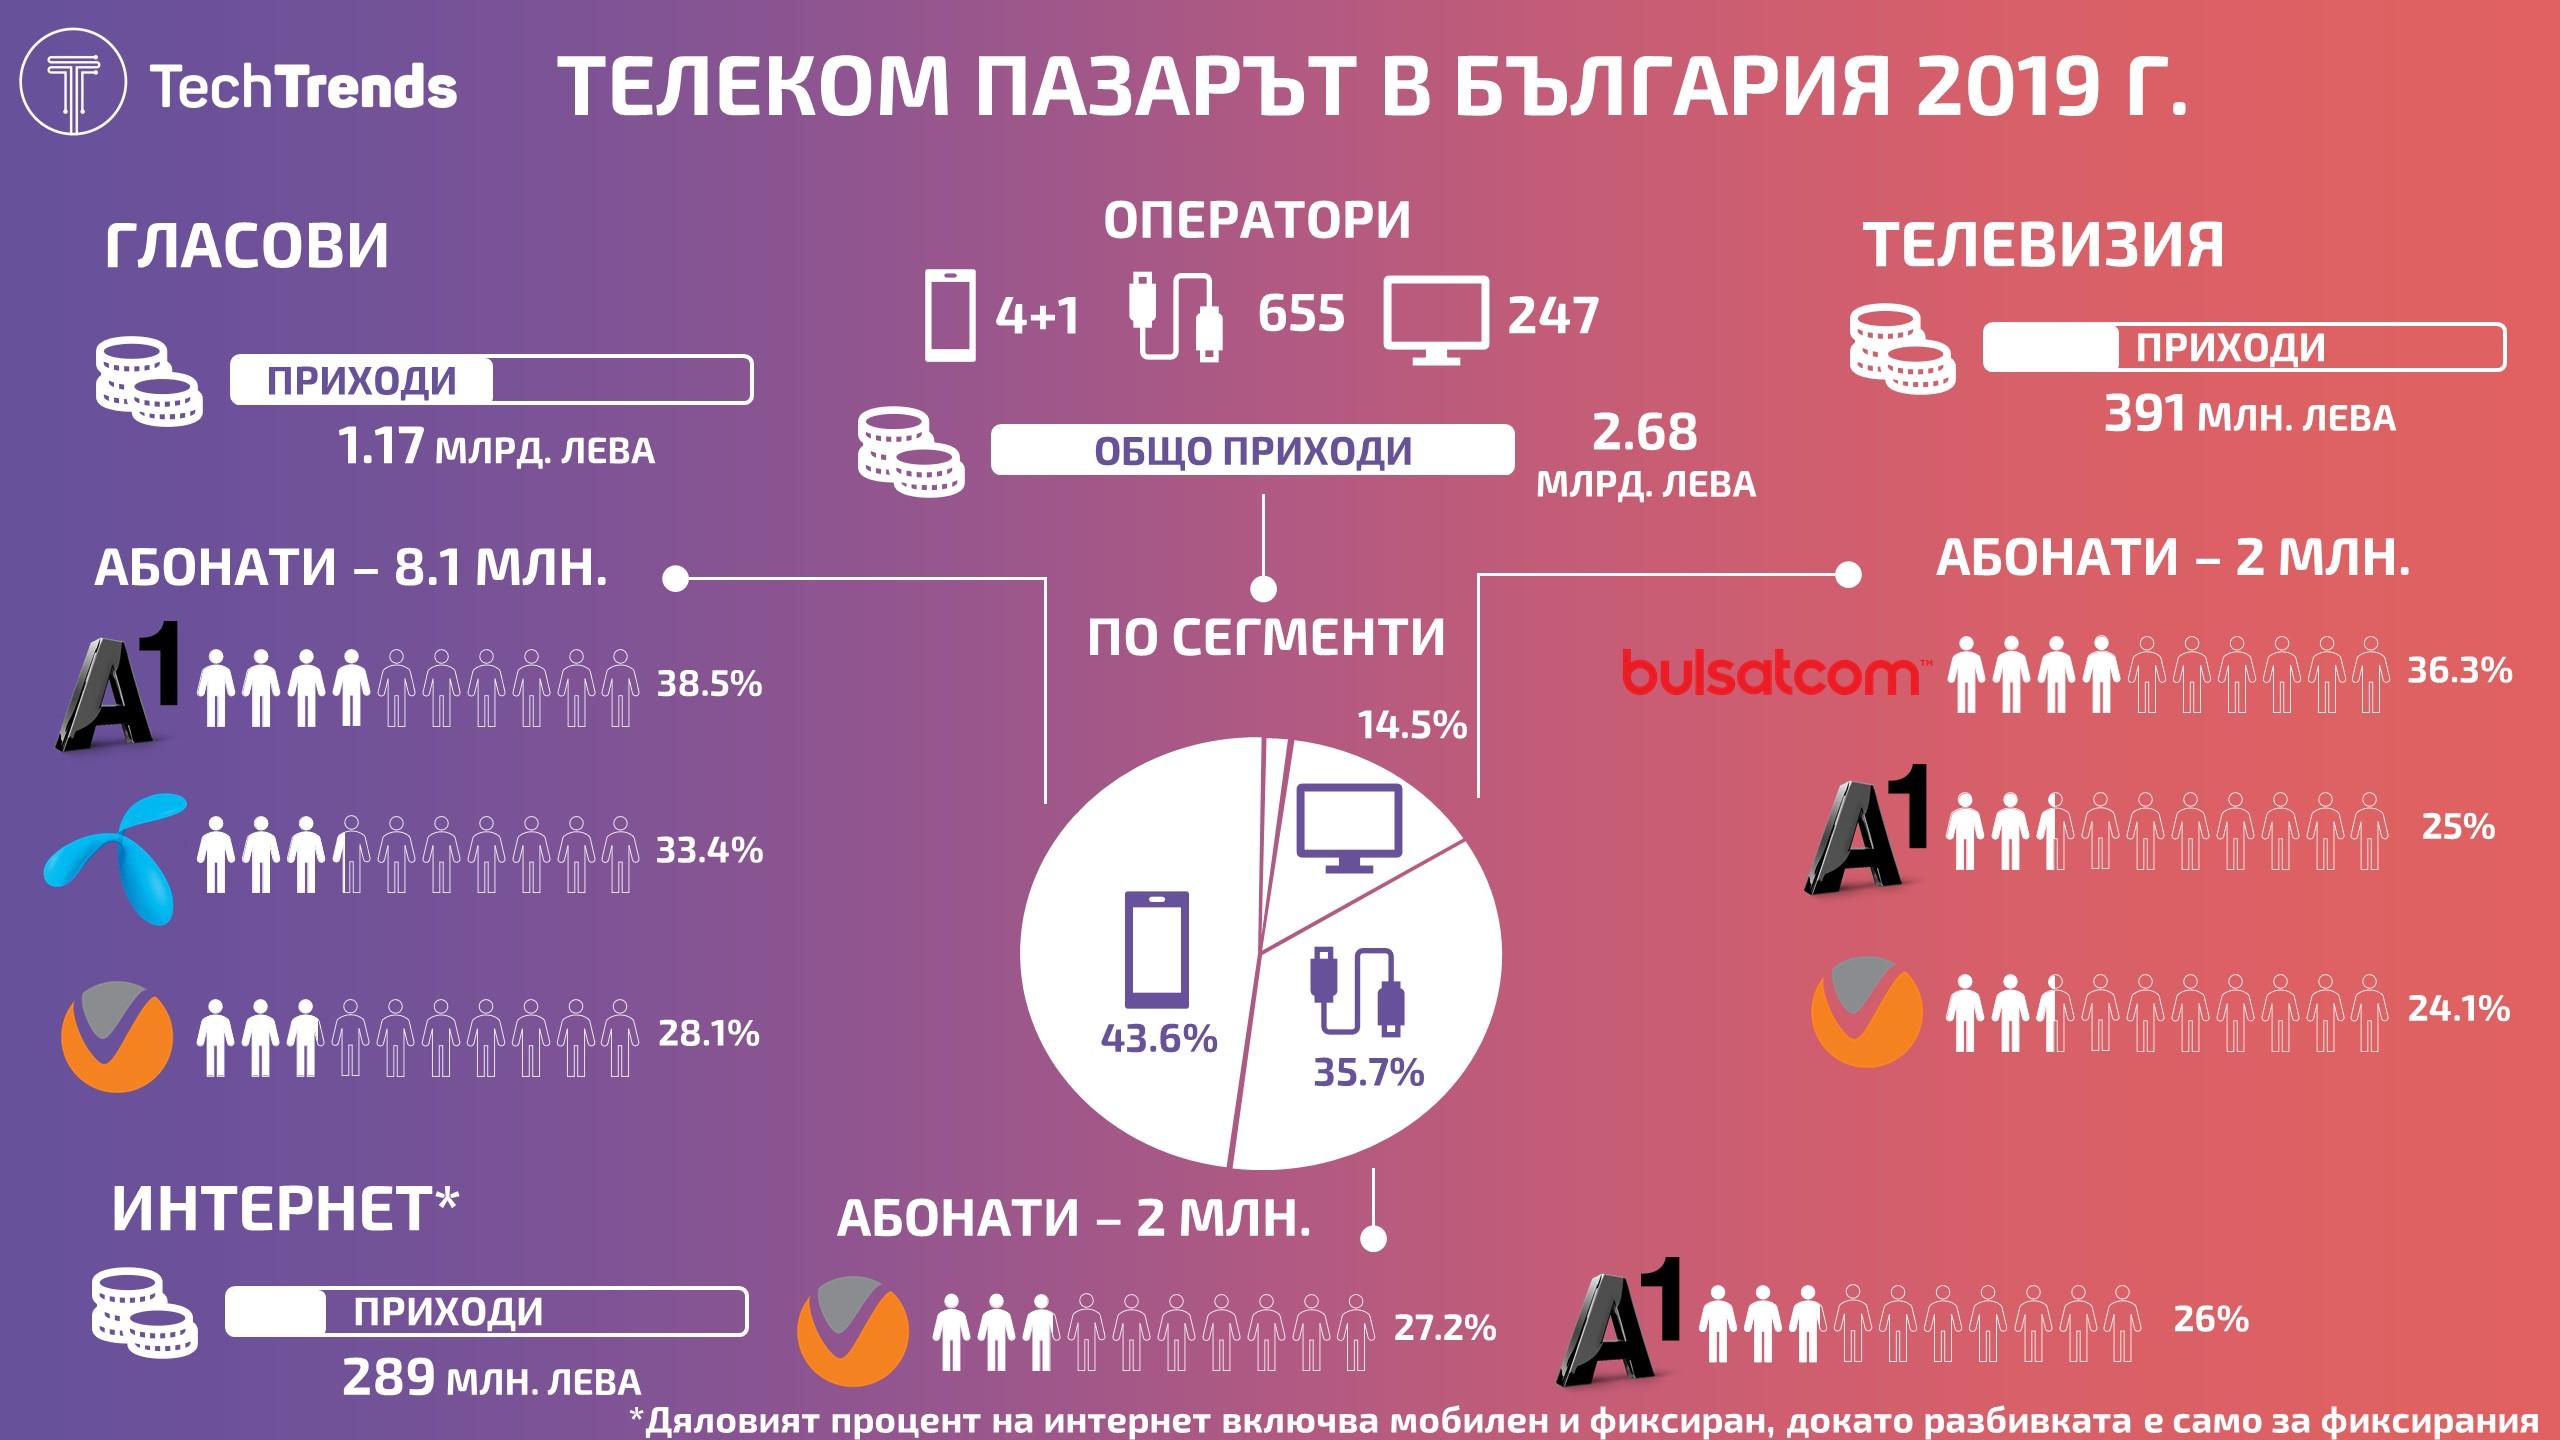 Bulgaria Telecom Market 2019